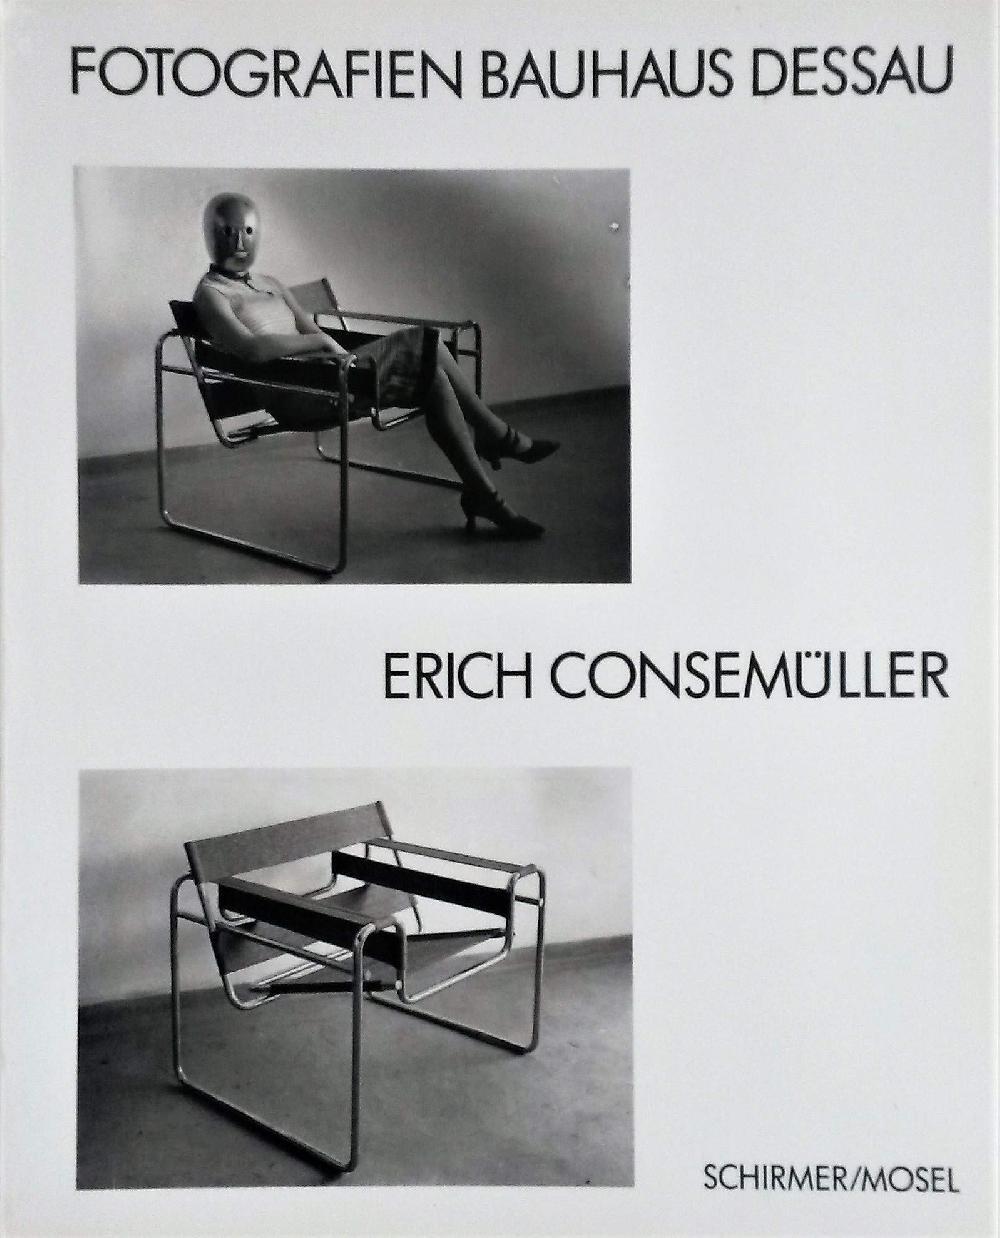 Fotografien Bauhaus Dessau